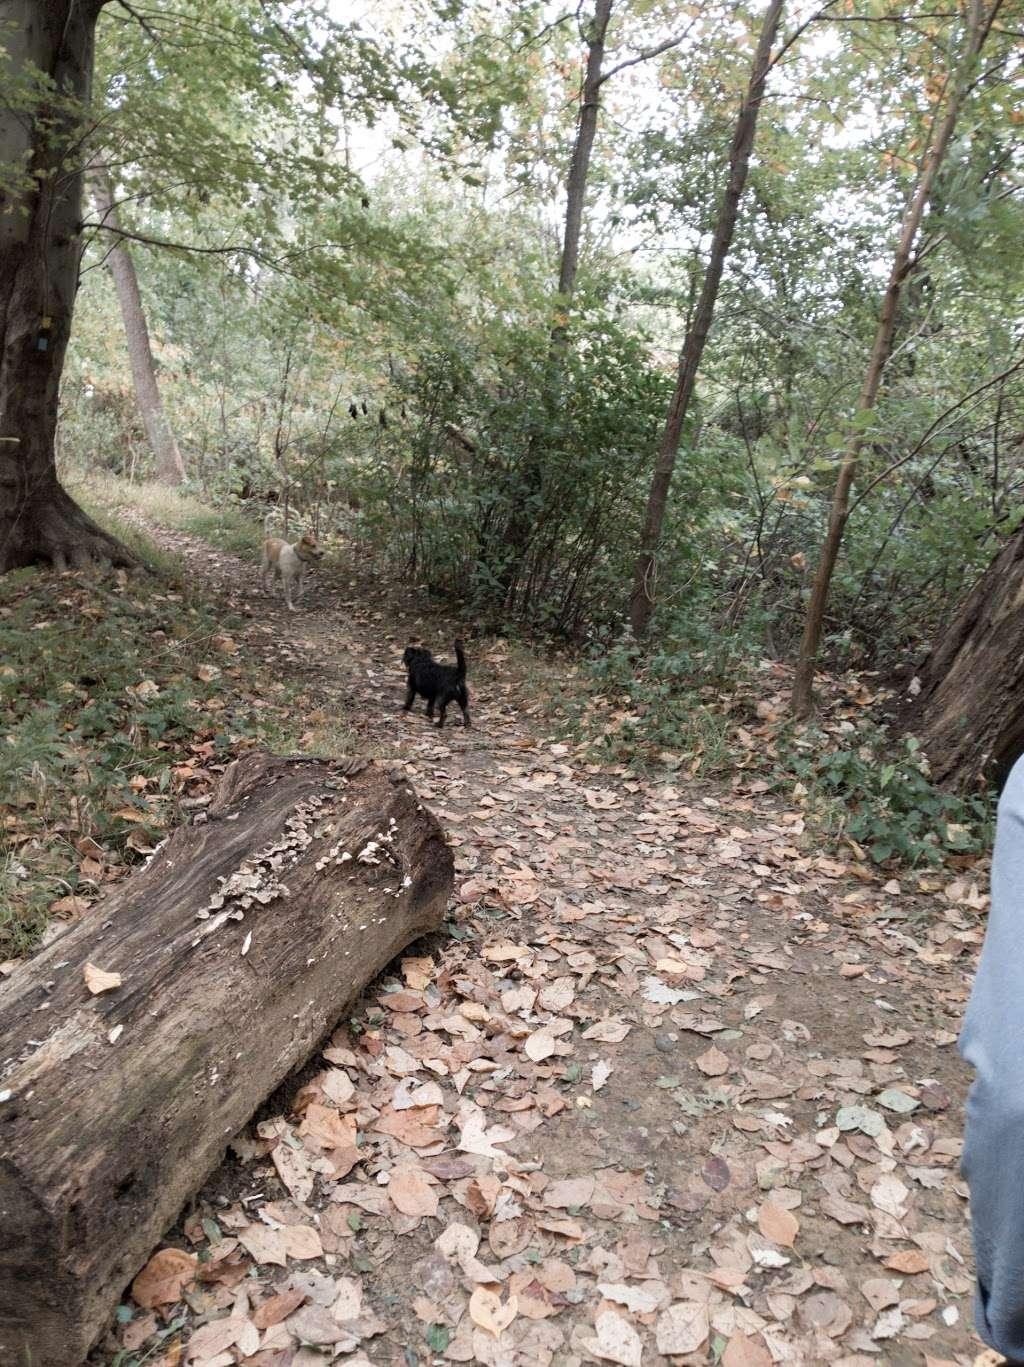 Losen Slote Creek Park - park  | Photo 6 of 10 | Address: Mehrhof Rd, Little Ferry, NJ 07643, USA